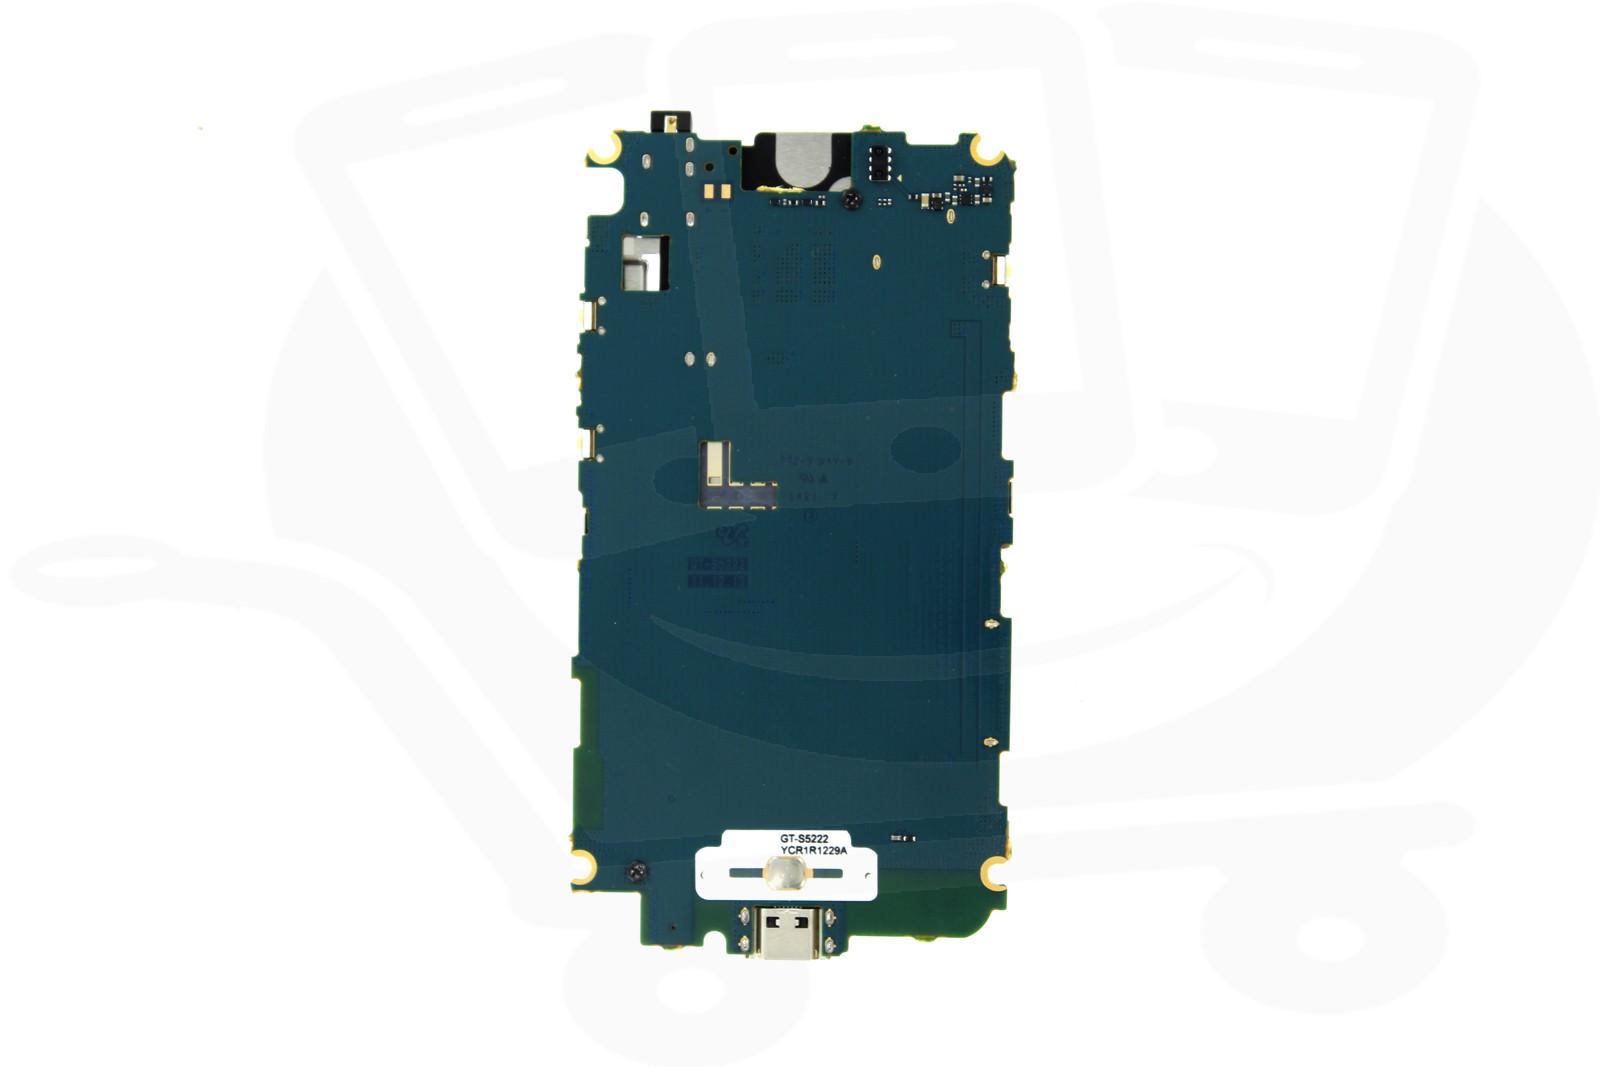 Genuine Samsung Star 3 S5222 Motherboard - GH82-06311A